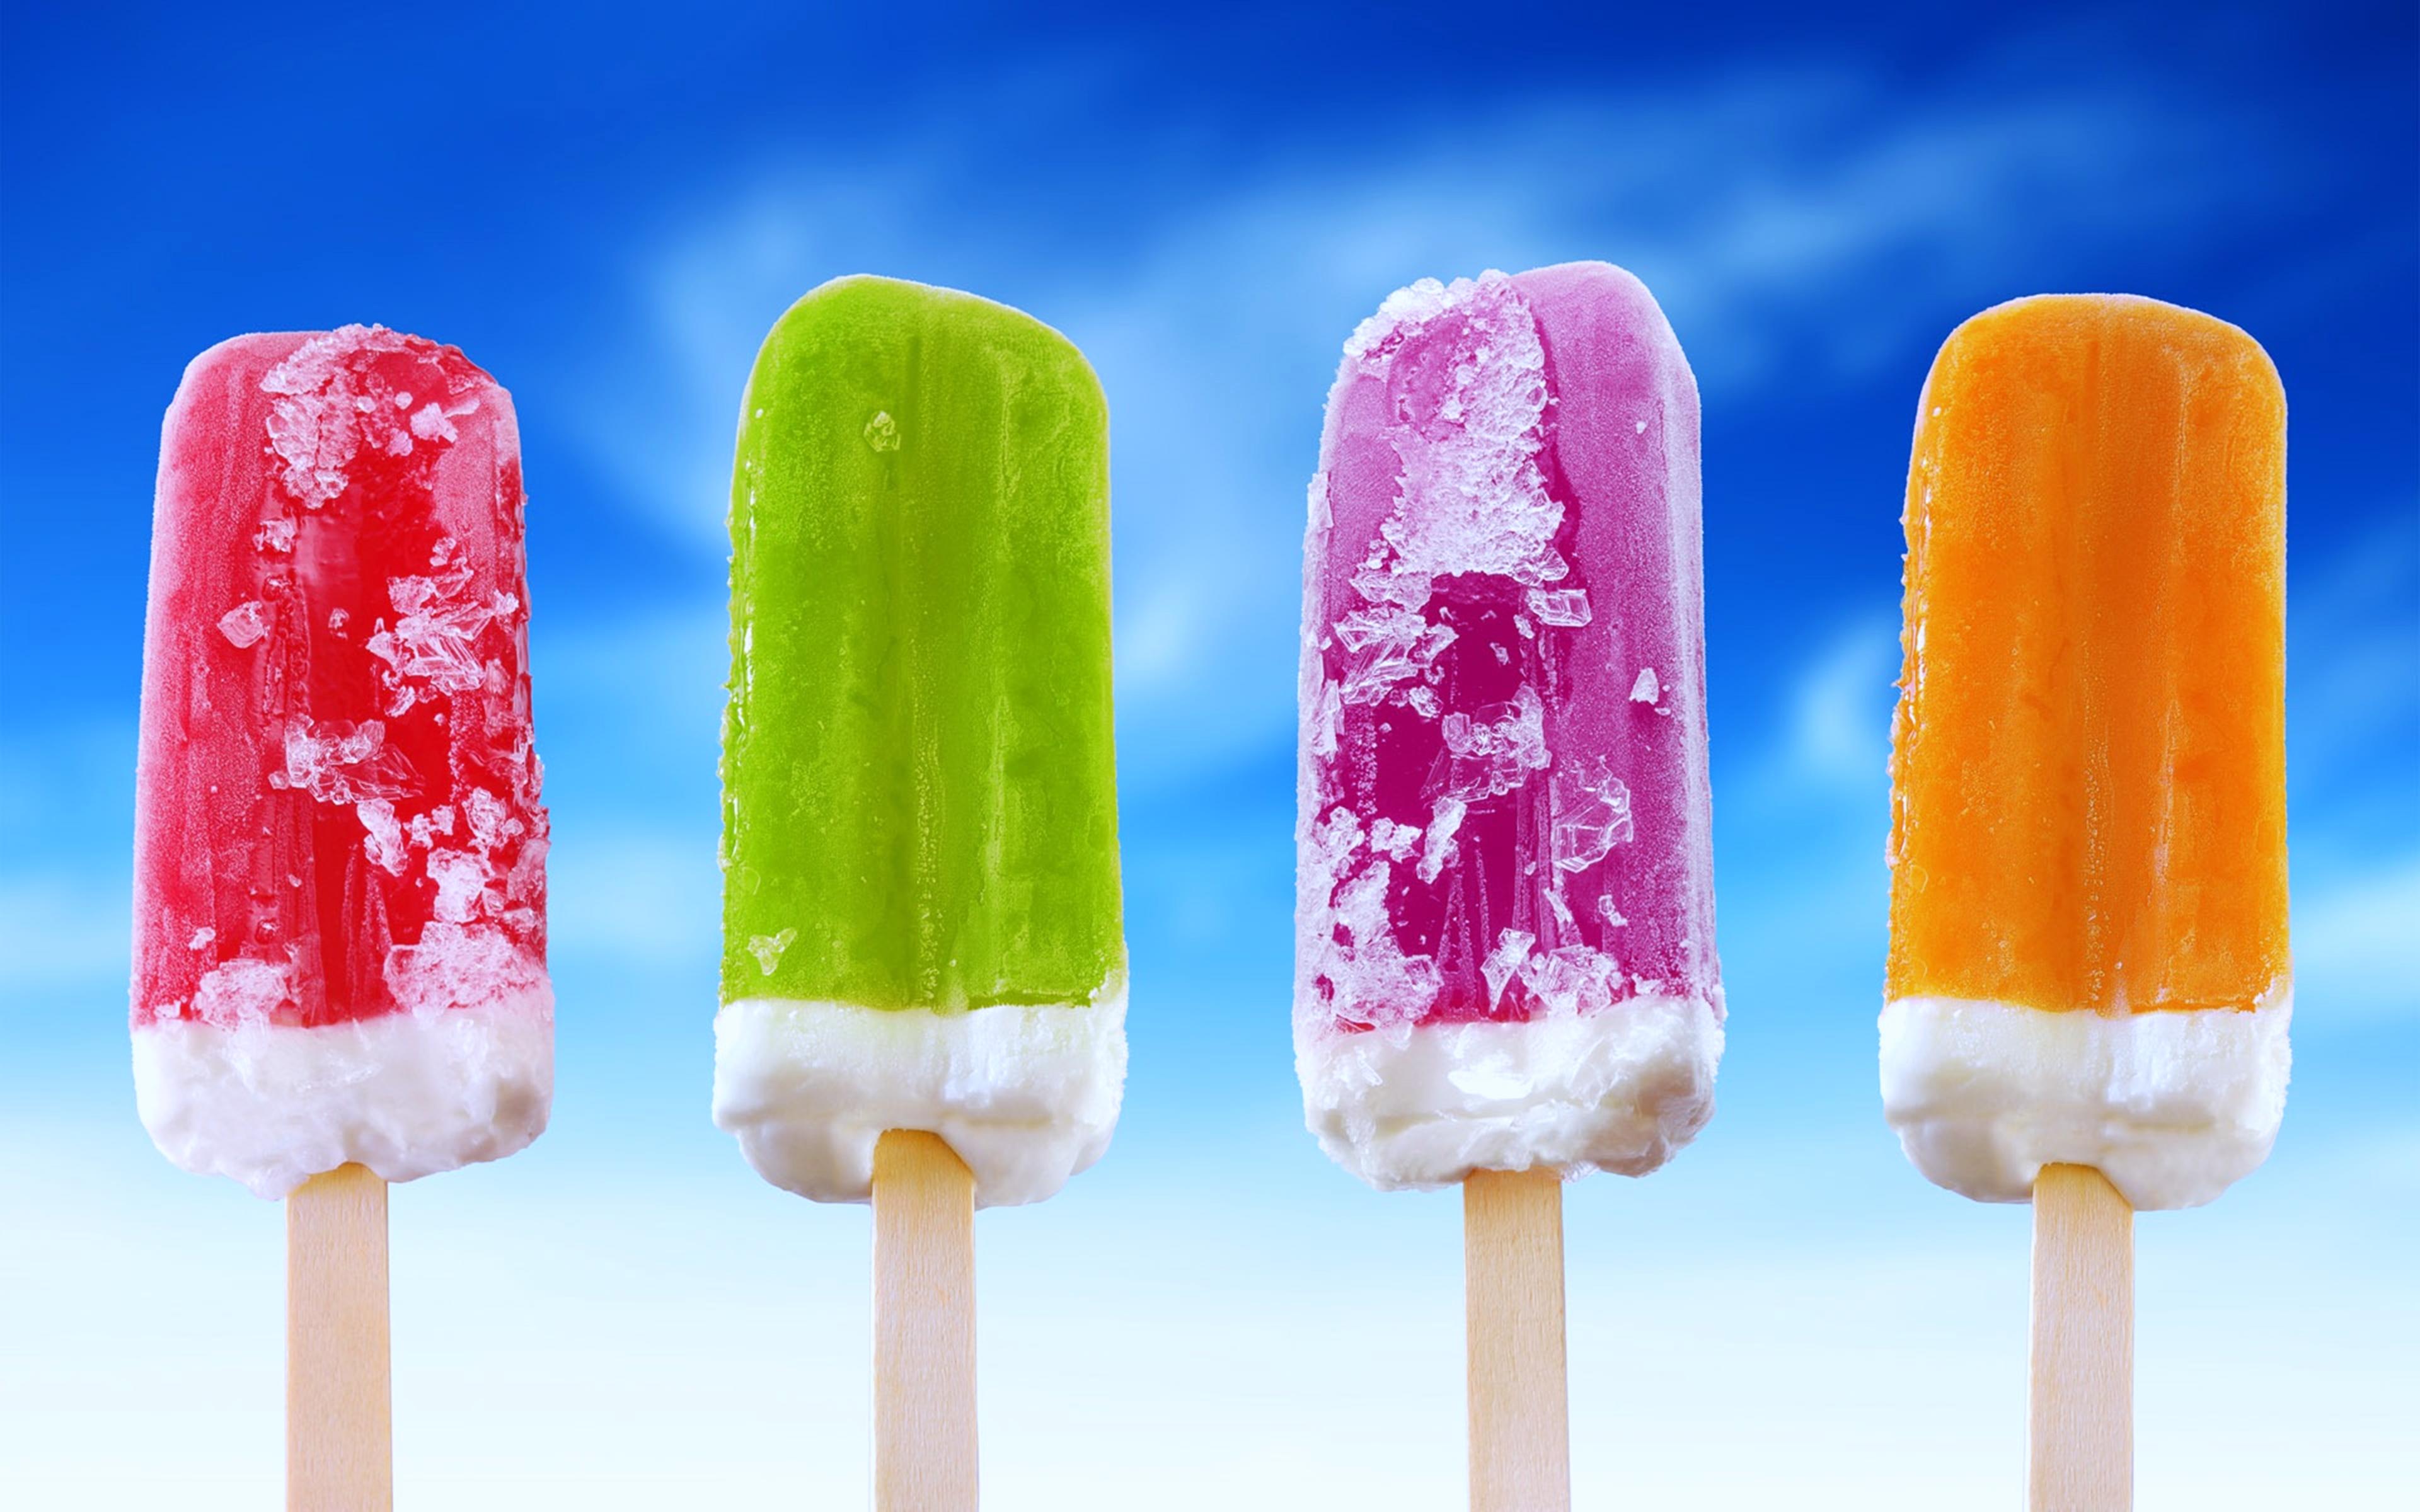 494 ice cream hd